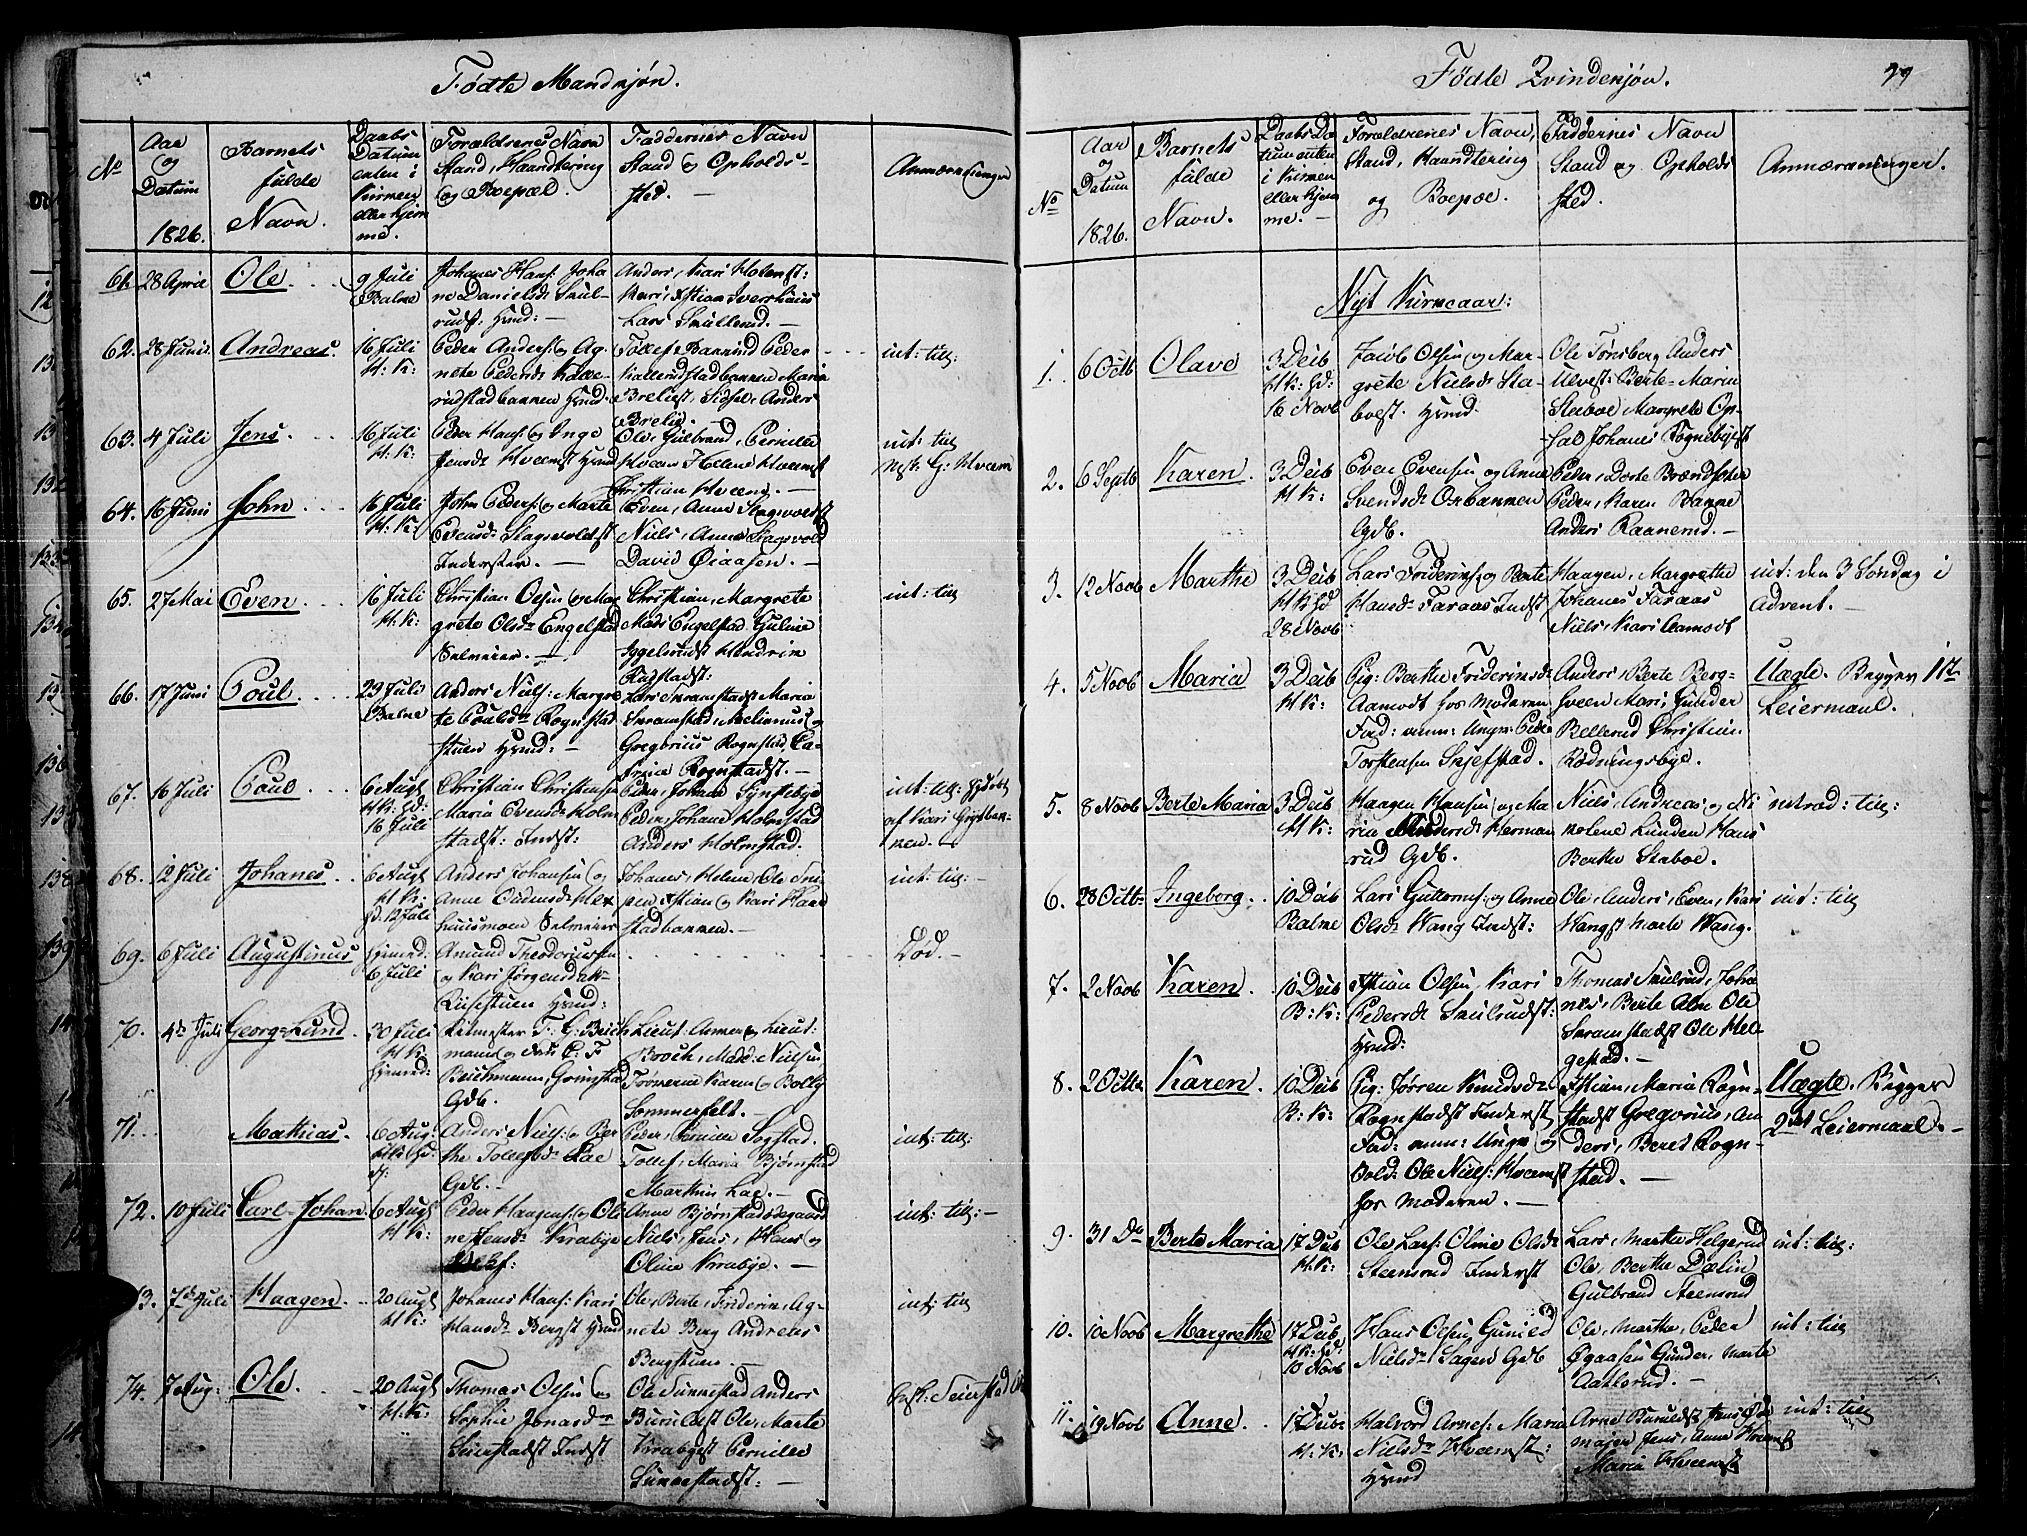 SAH, Toten prestekontor, Ministerialbok nr. 10, 1820-1828, s. 99